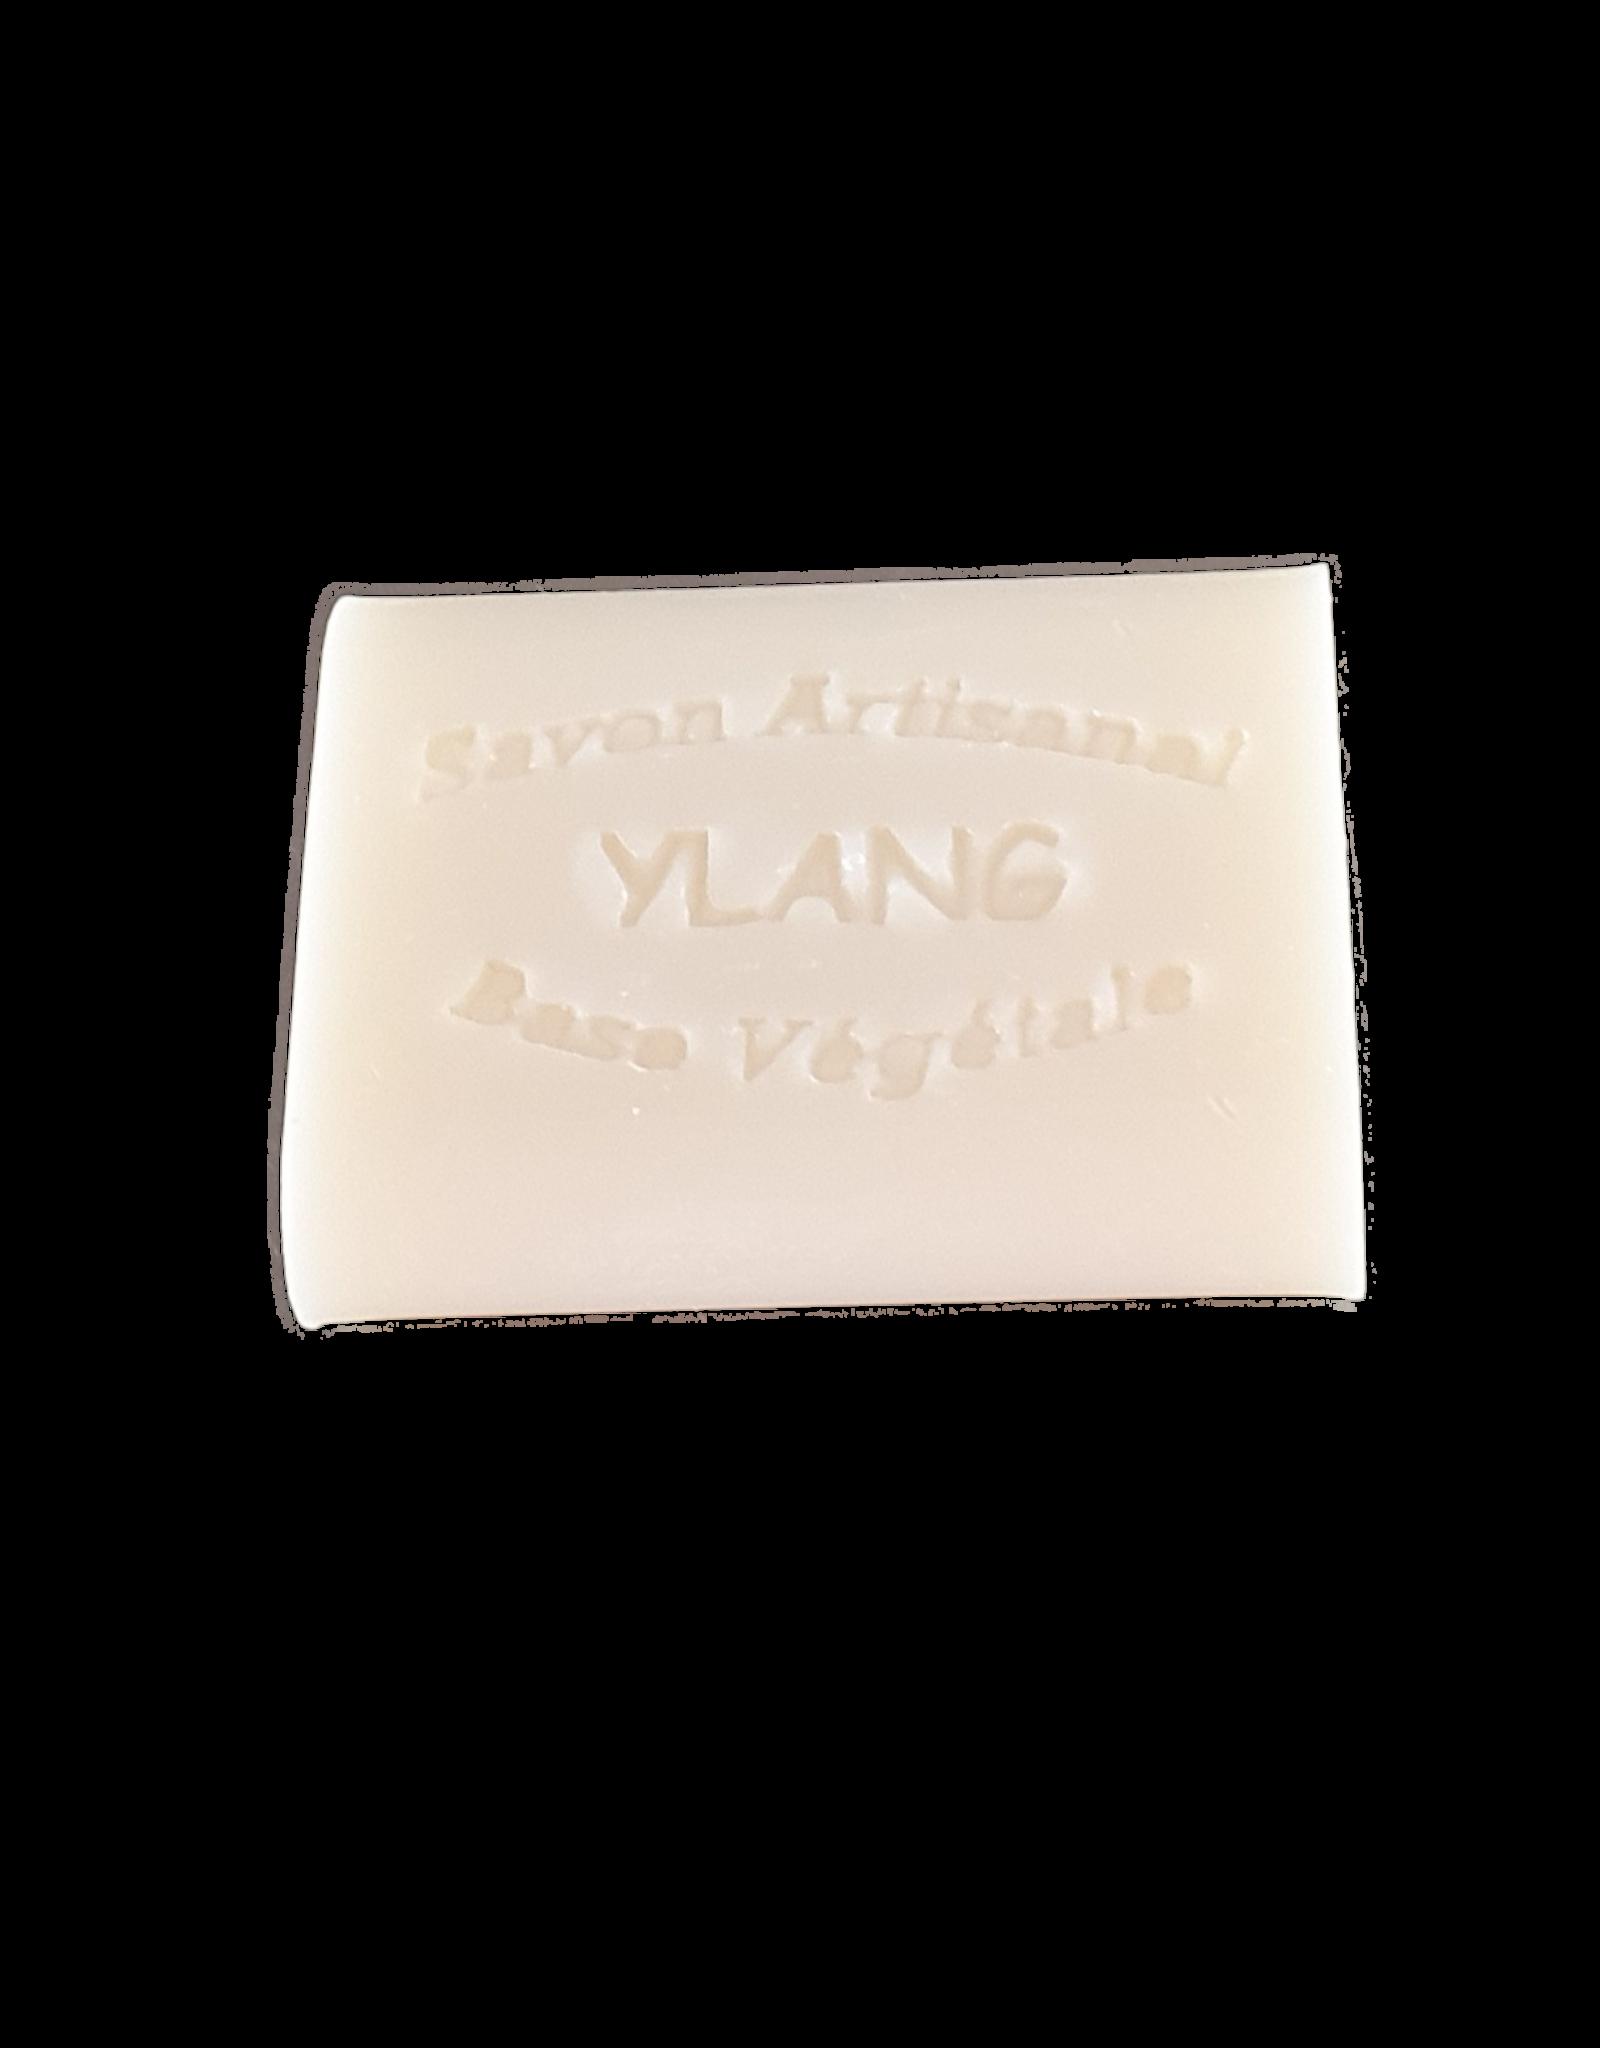 Ambachtelijke zeep 'Ylang' - Body & Soap